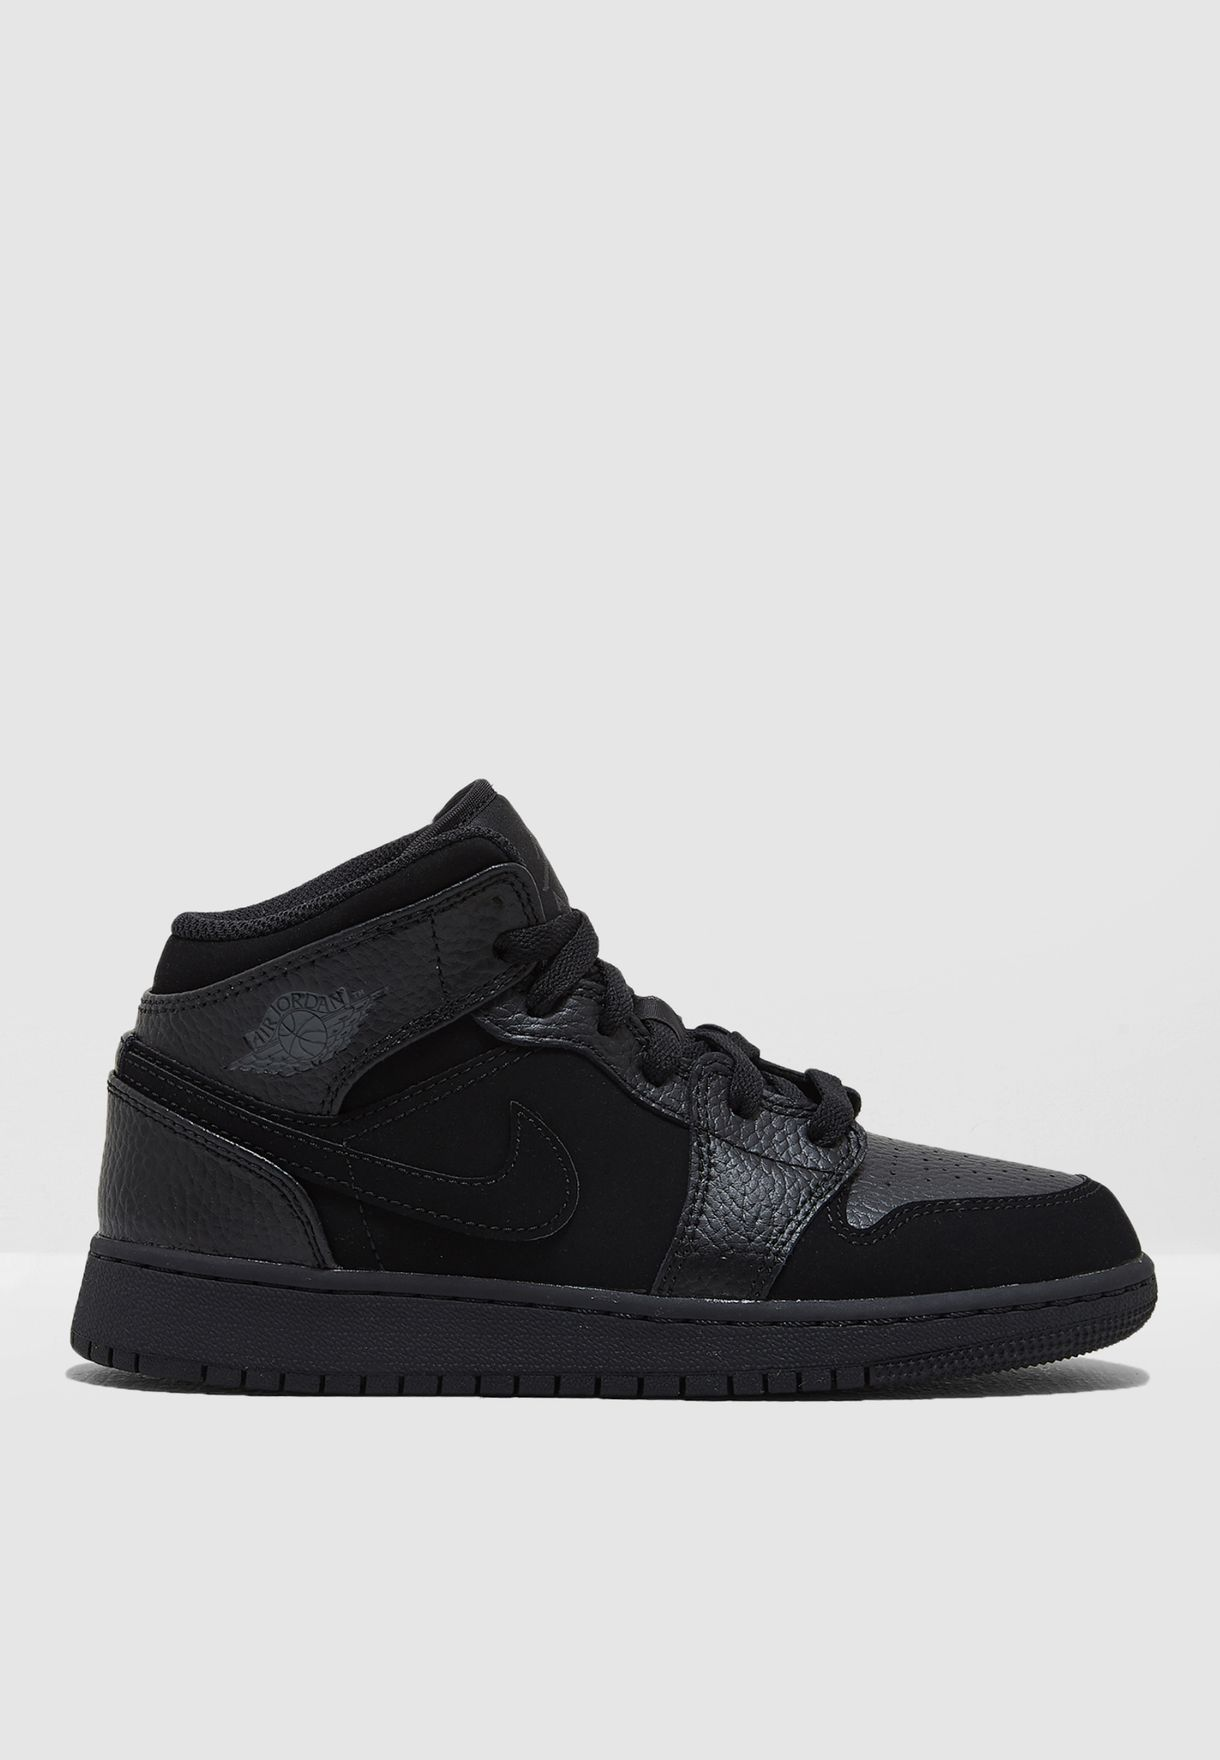 233714cff78 Shop Nike black Youth Air Jordan 1 Mid BG 554725-064 for Kids in UAE ...